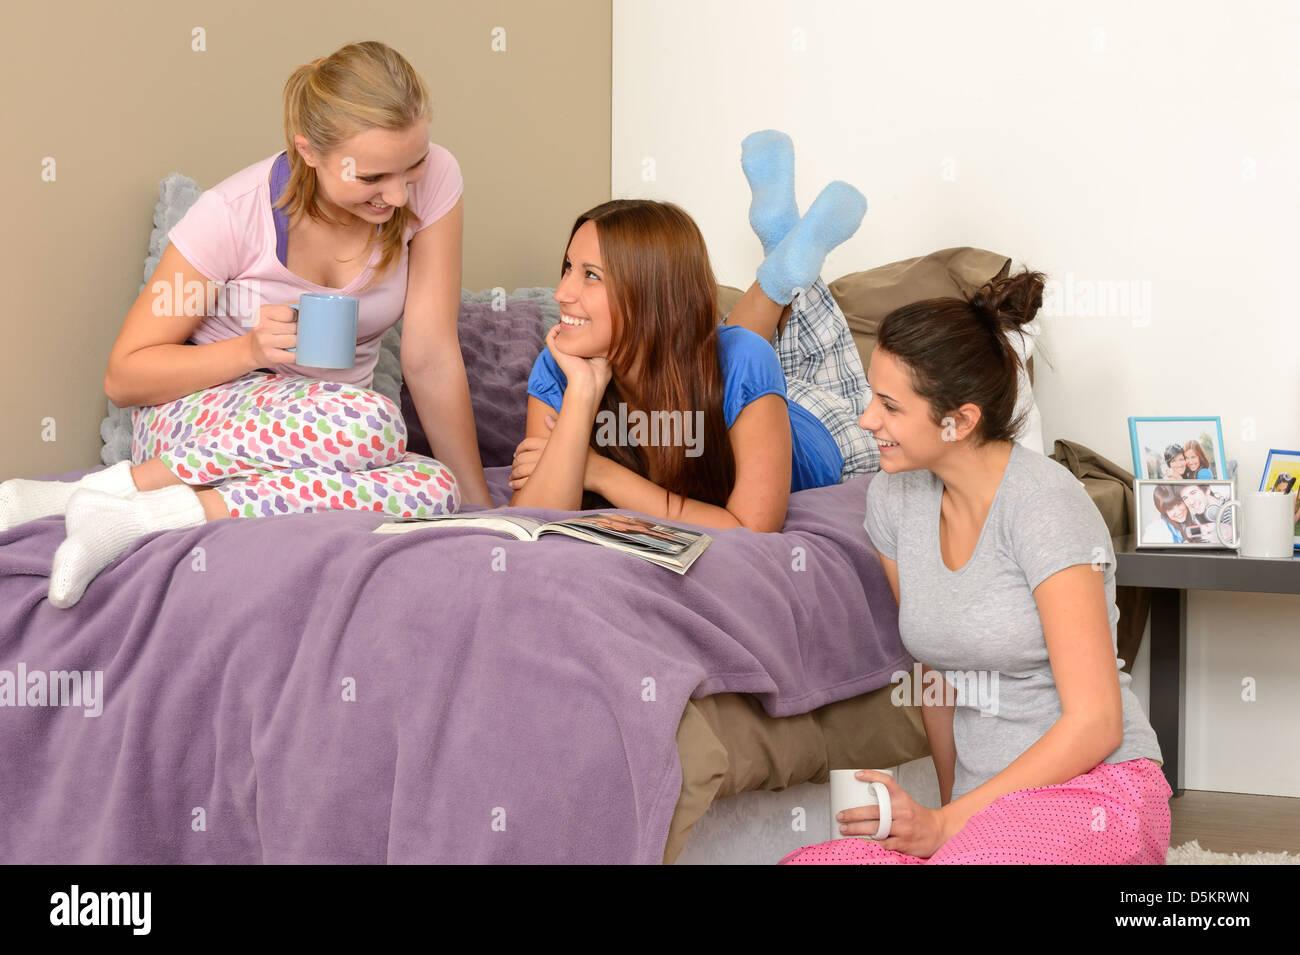 Three Teenage Girls Talking At Pajama Party In Bedroom